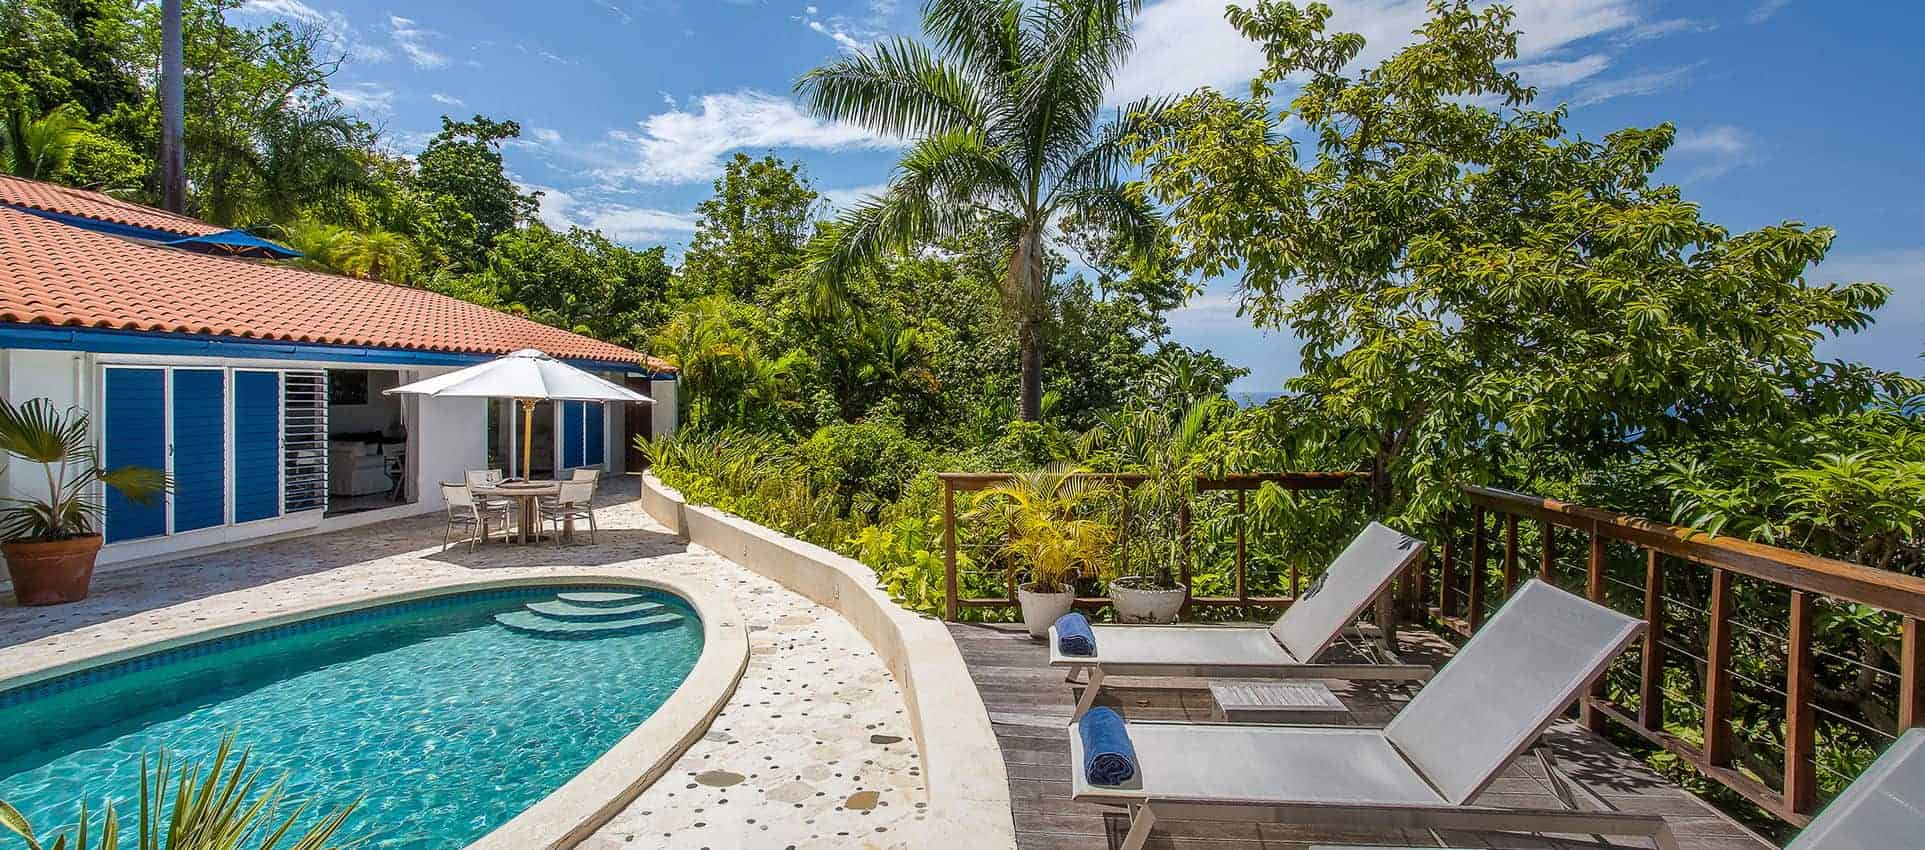 honeymoon top 10 alternative destinations Port Antonio Jamaica Geejam Hotel